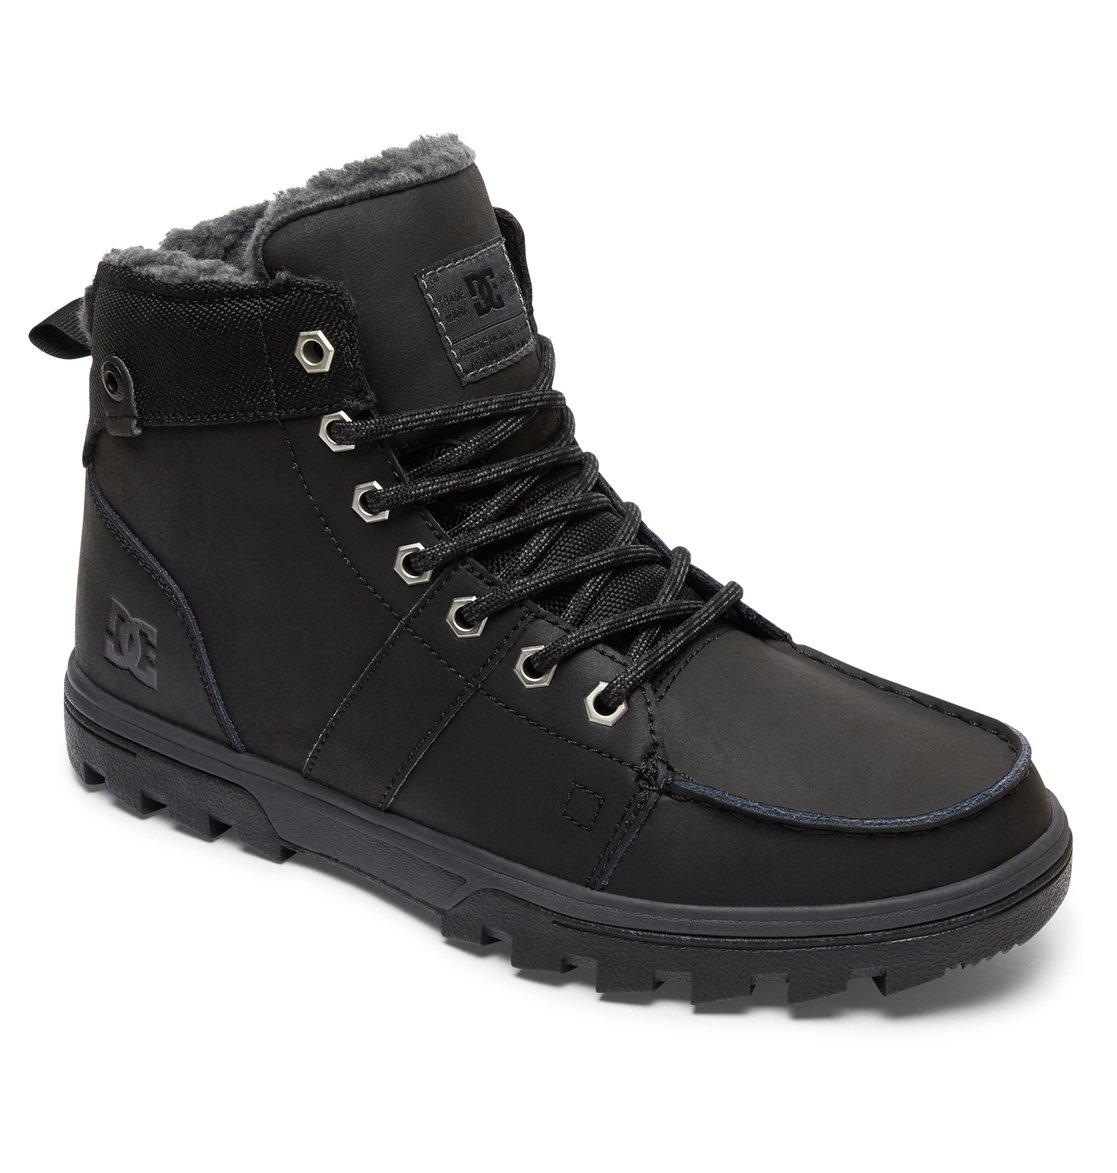 DC Shoes™ Men's Woodland Winter Boots 303241 | eBay